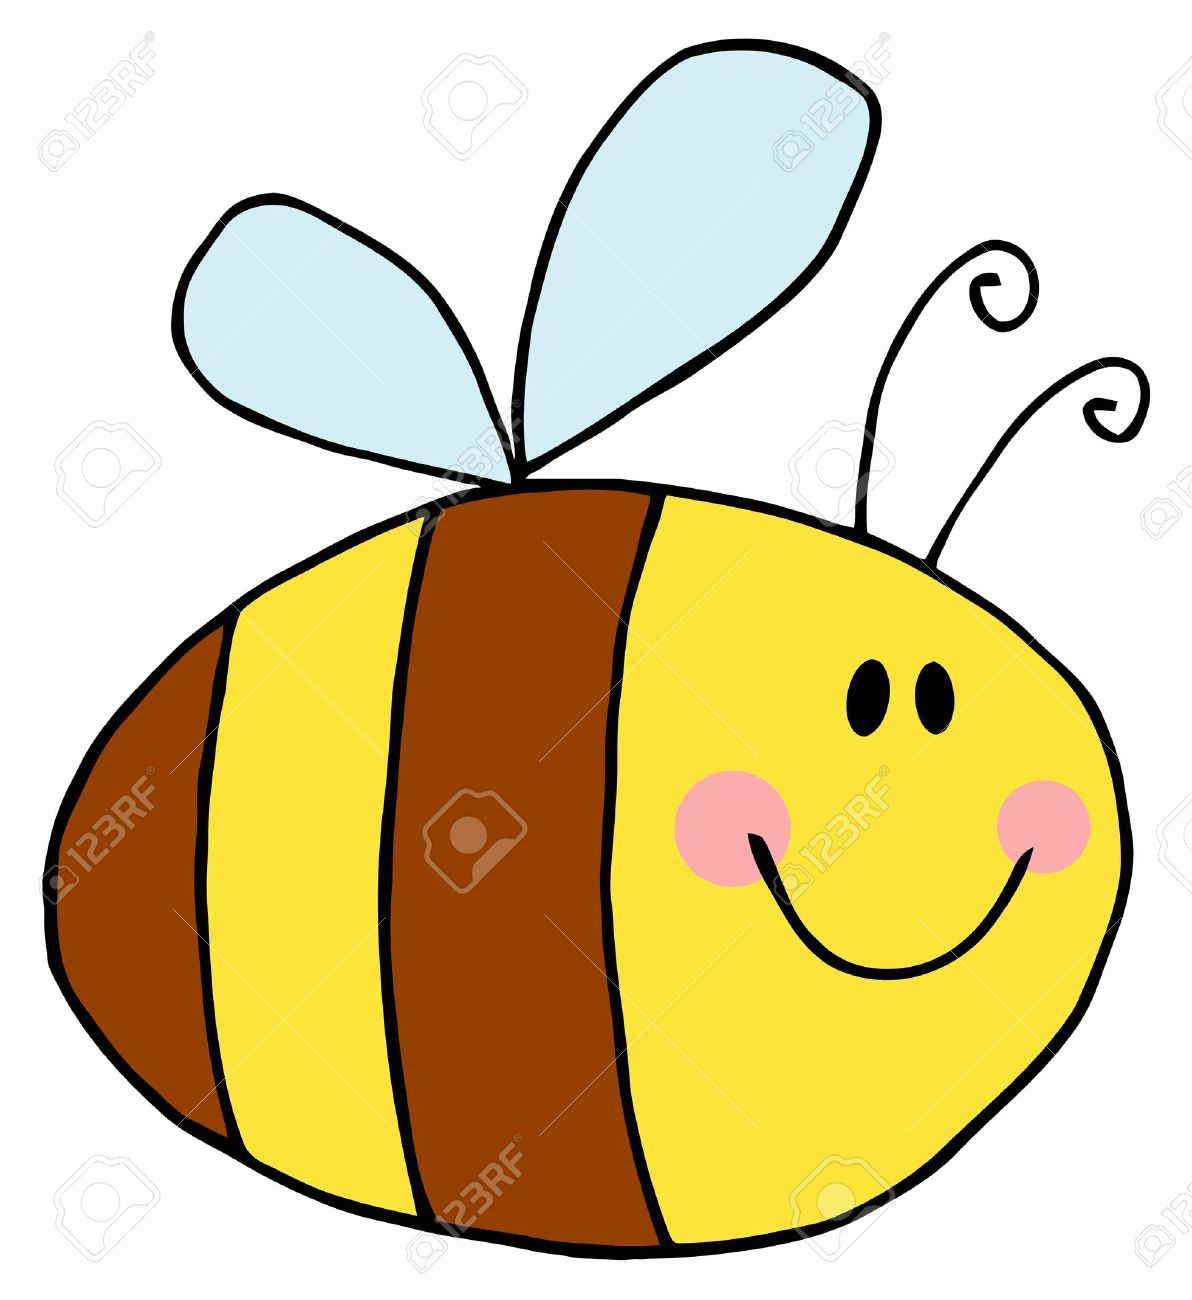 Flying Bee Cartoon Character Stock Vector - 9276555